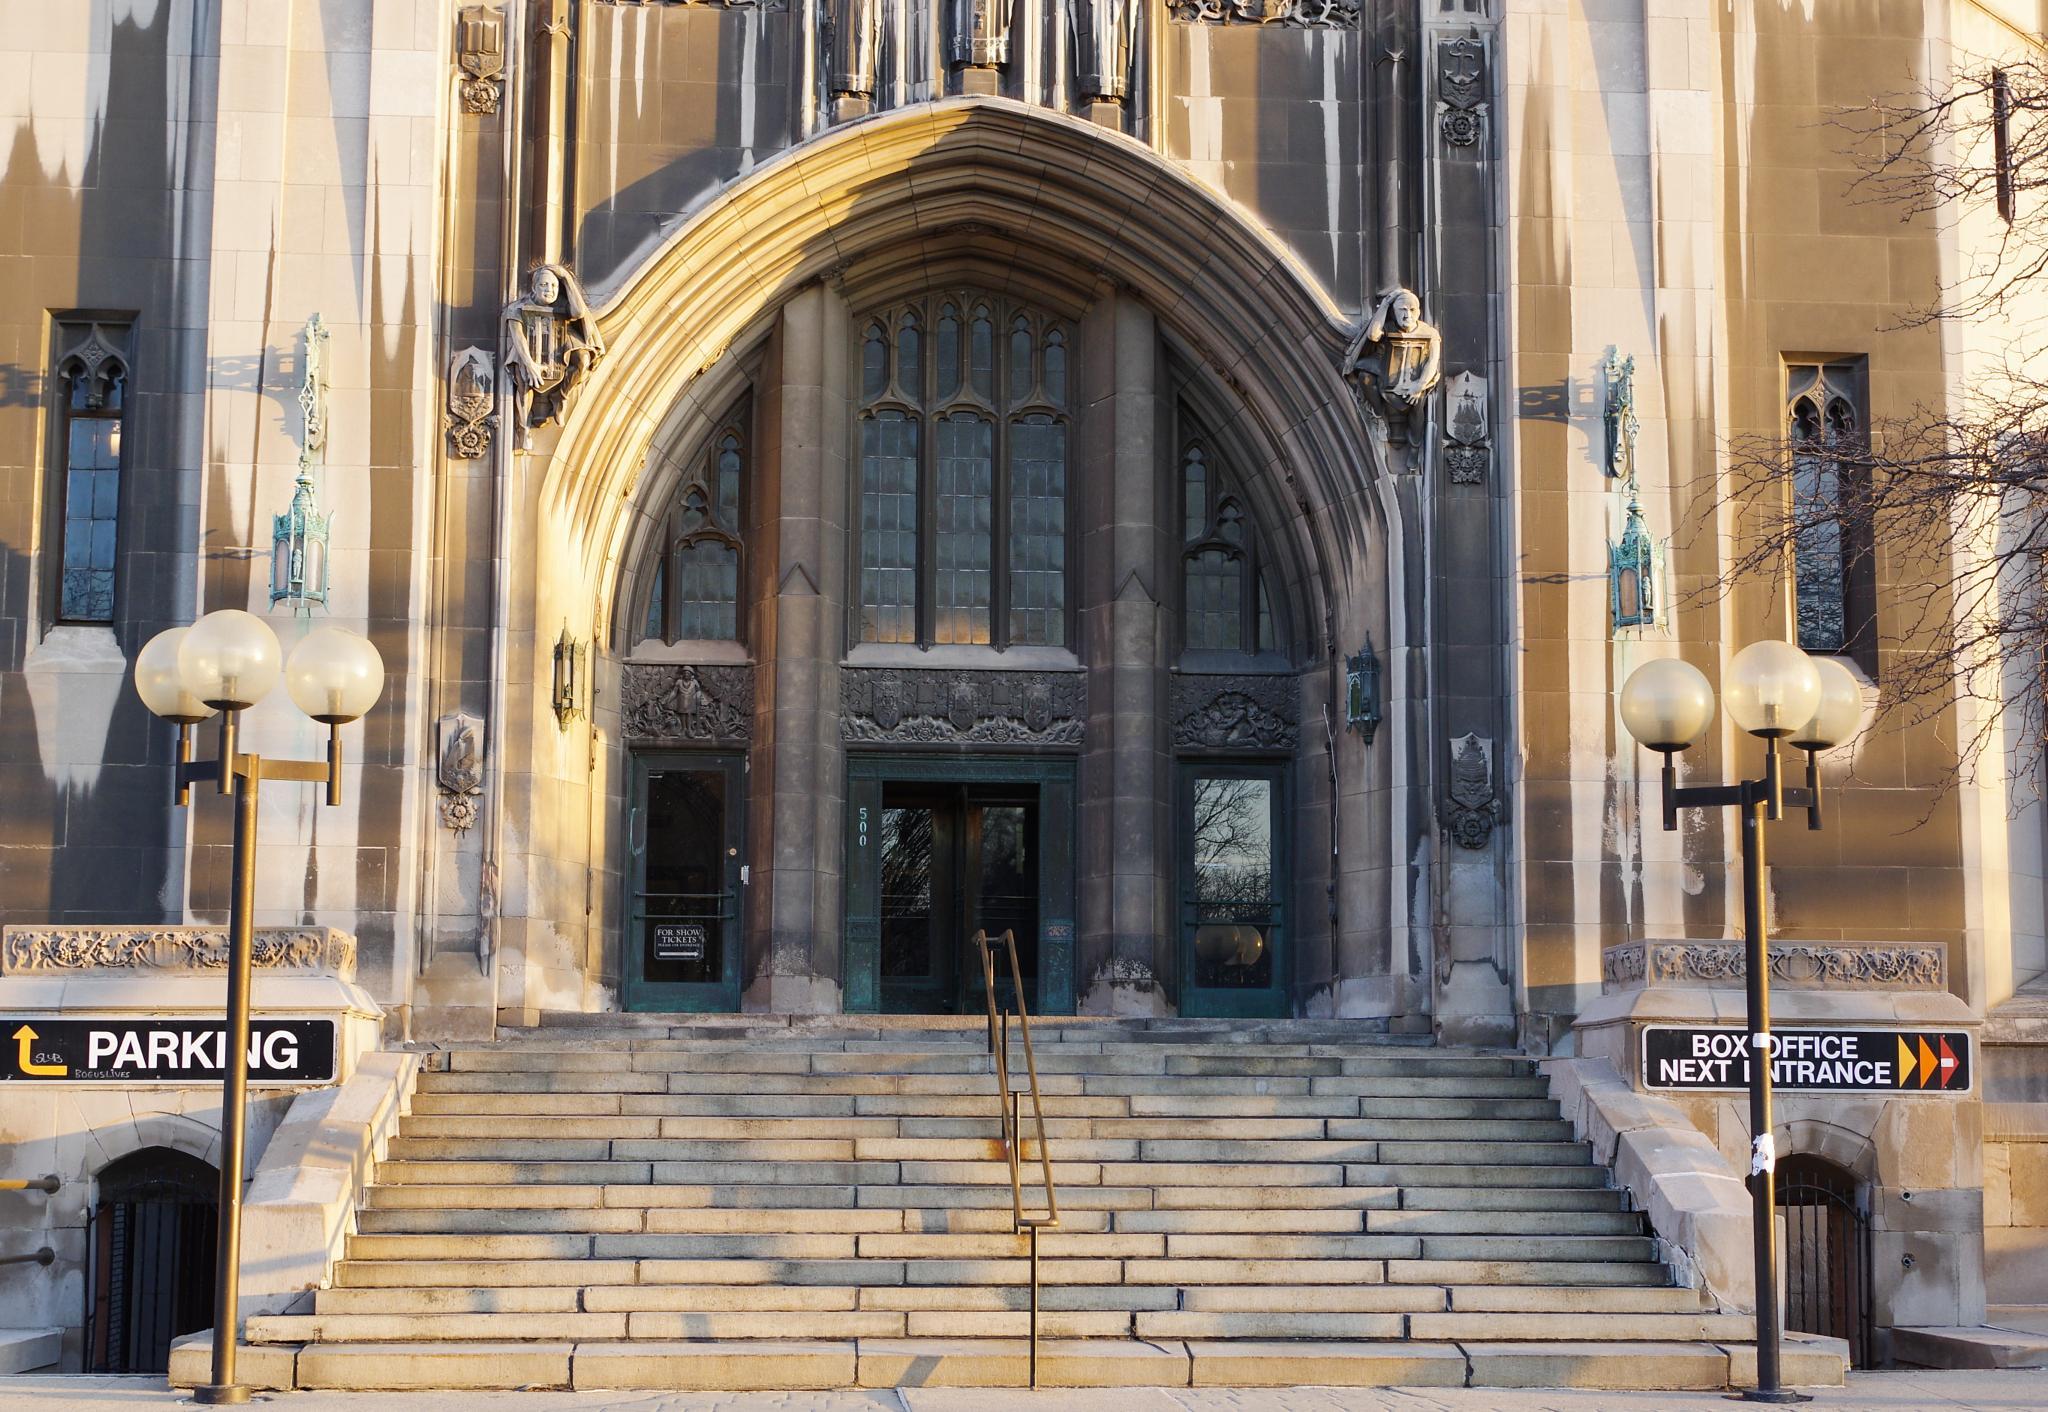 Masonic Temple by chuckhildebrandt7